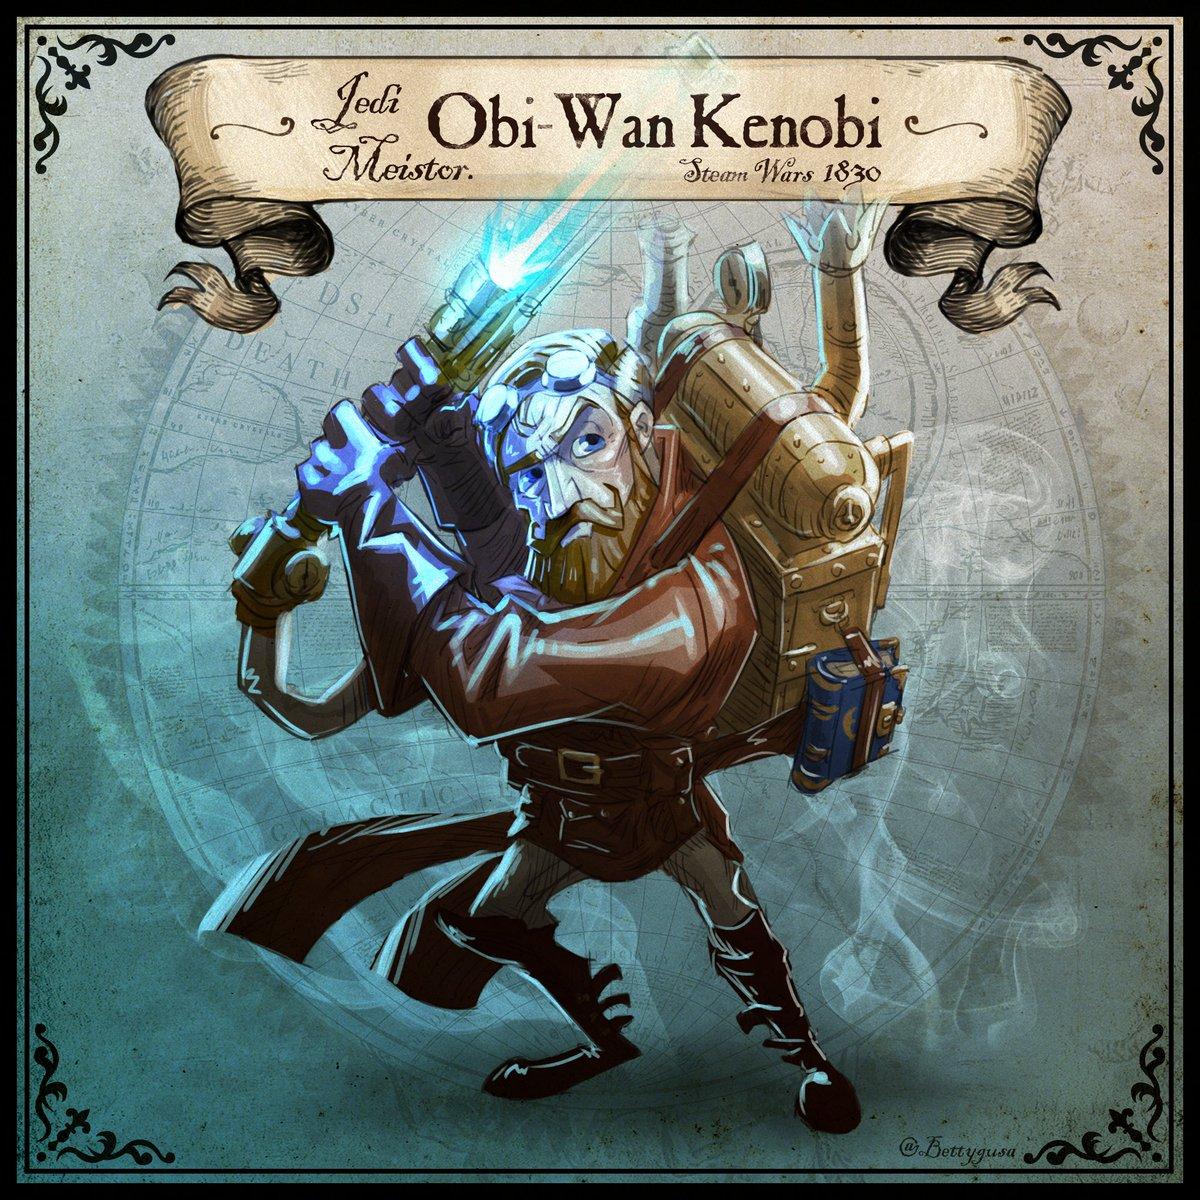 #Artwork Awesome of the Day: #Steampunk ⚙️ #StarWars Obi-Wan Kenobi #Illustration 🖼️ By #2D Artist #Designer @bettygusa #SamaArt